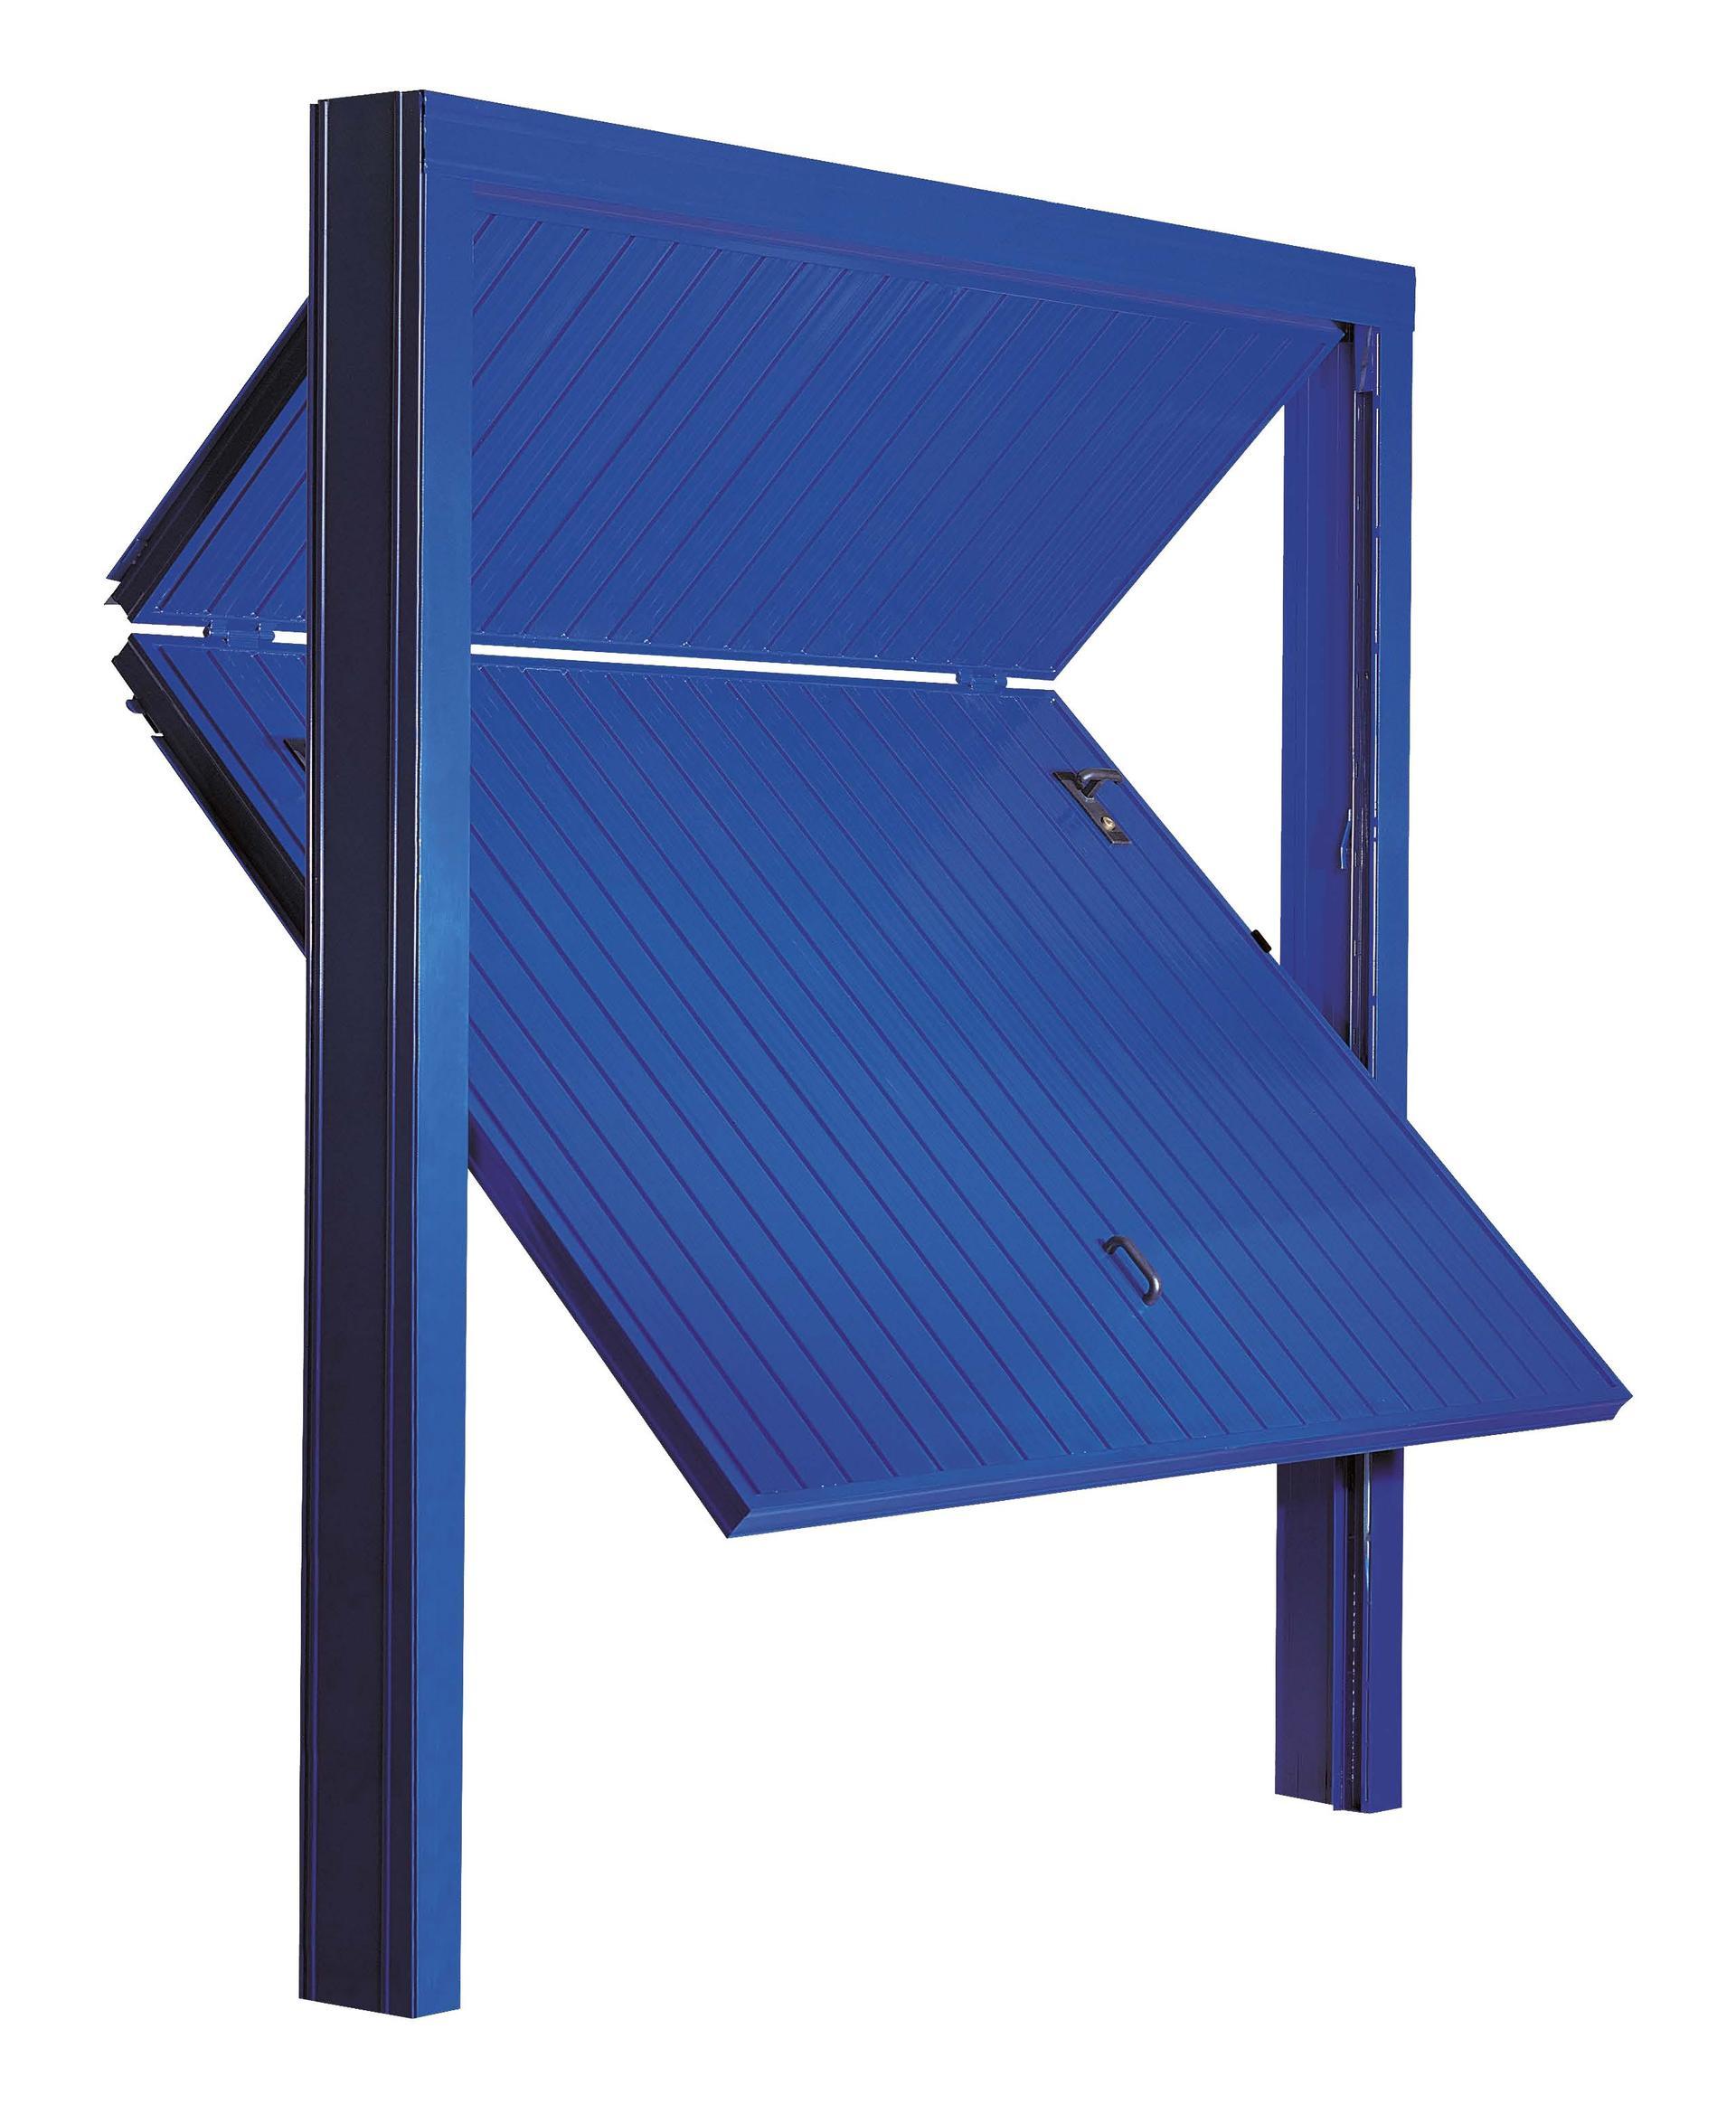 Porte basculanti su misura piancogno bs sandrini serrande for Sandrini serrande